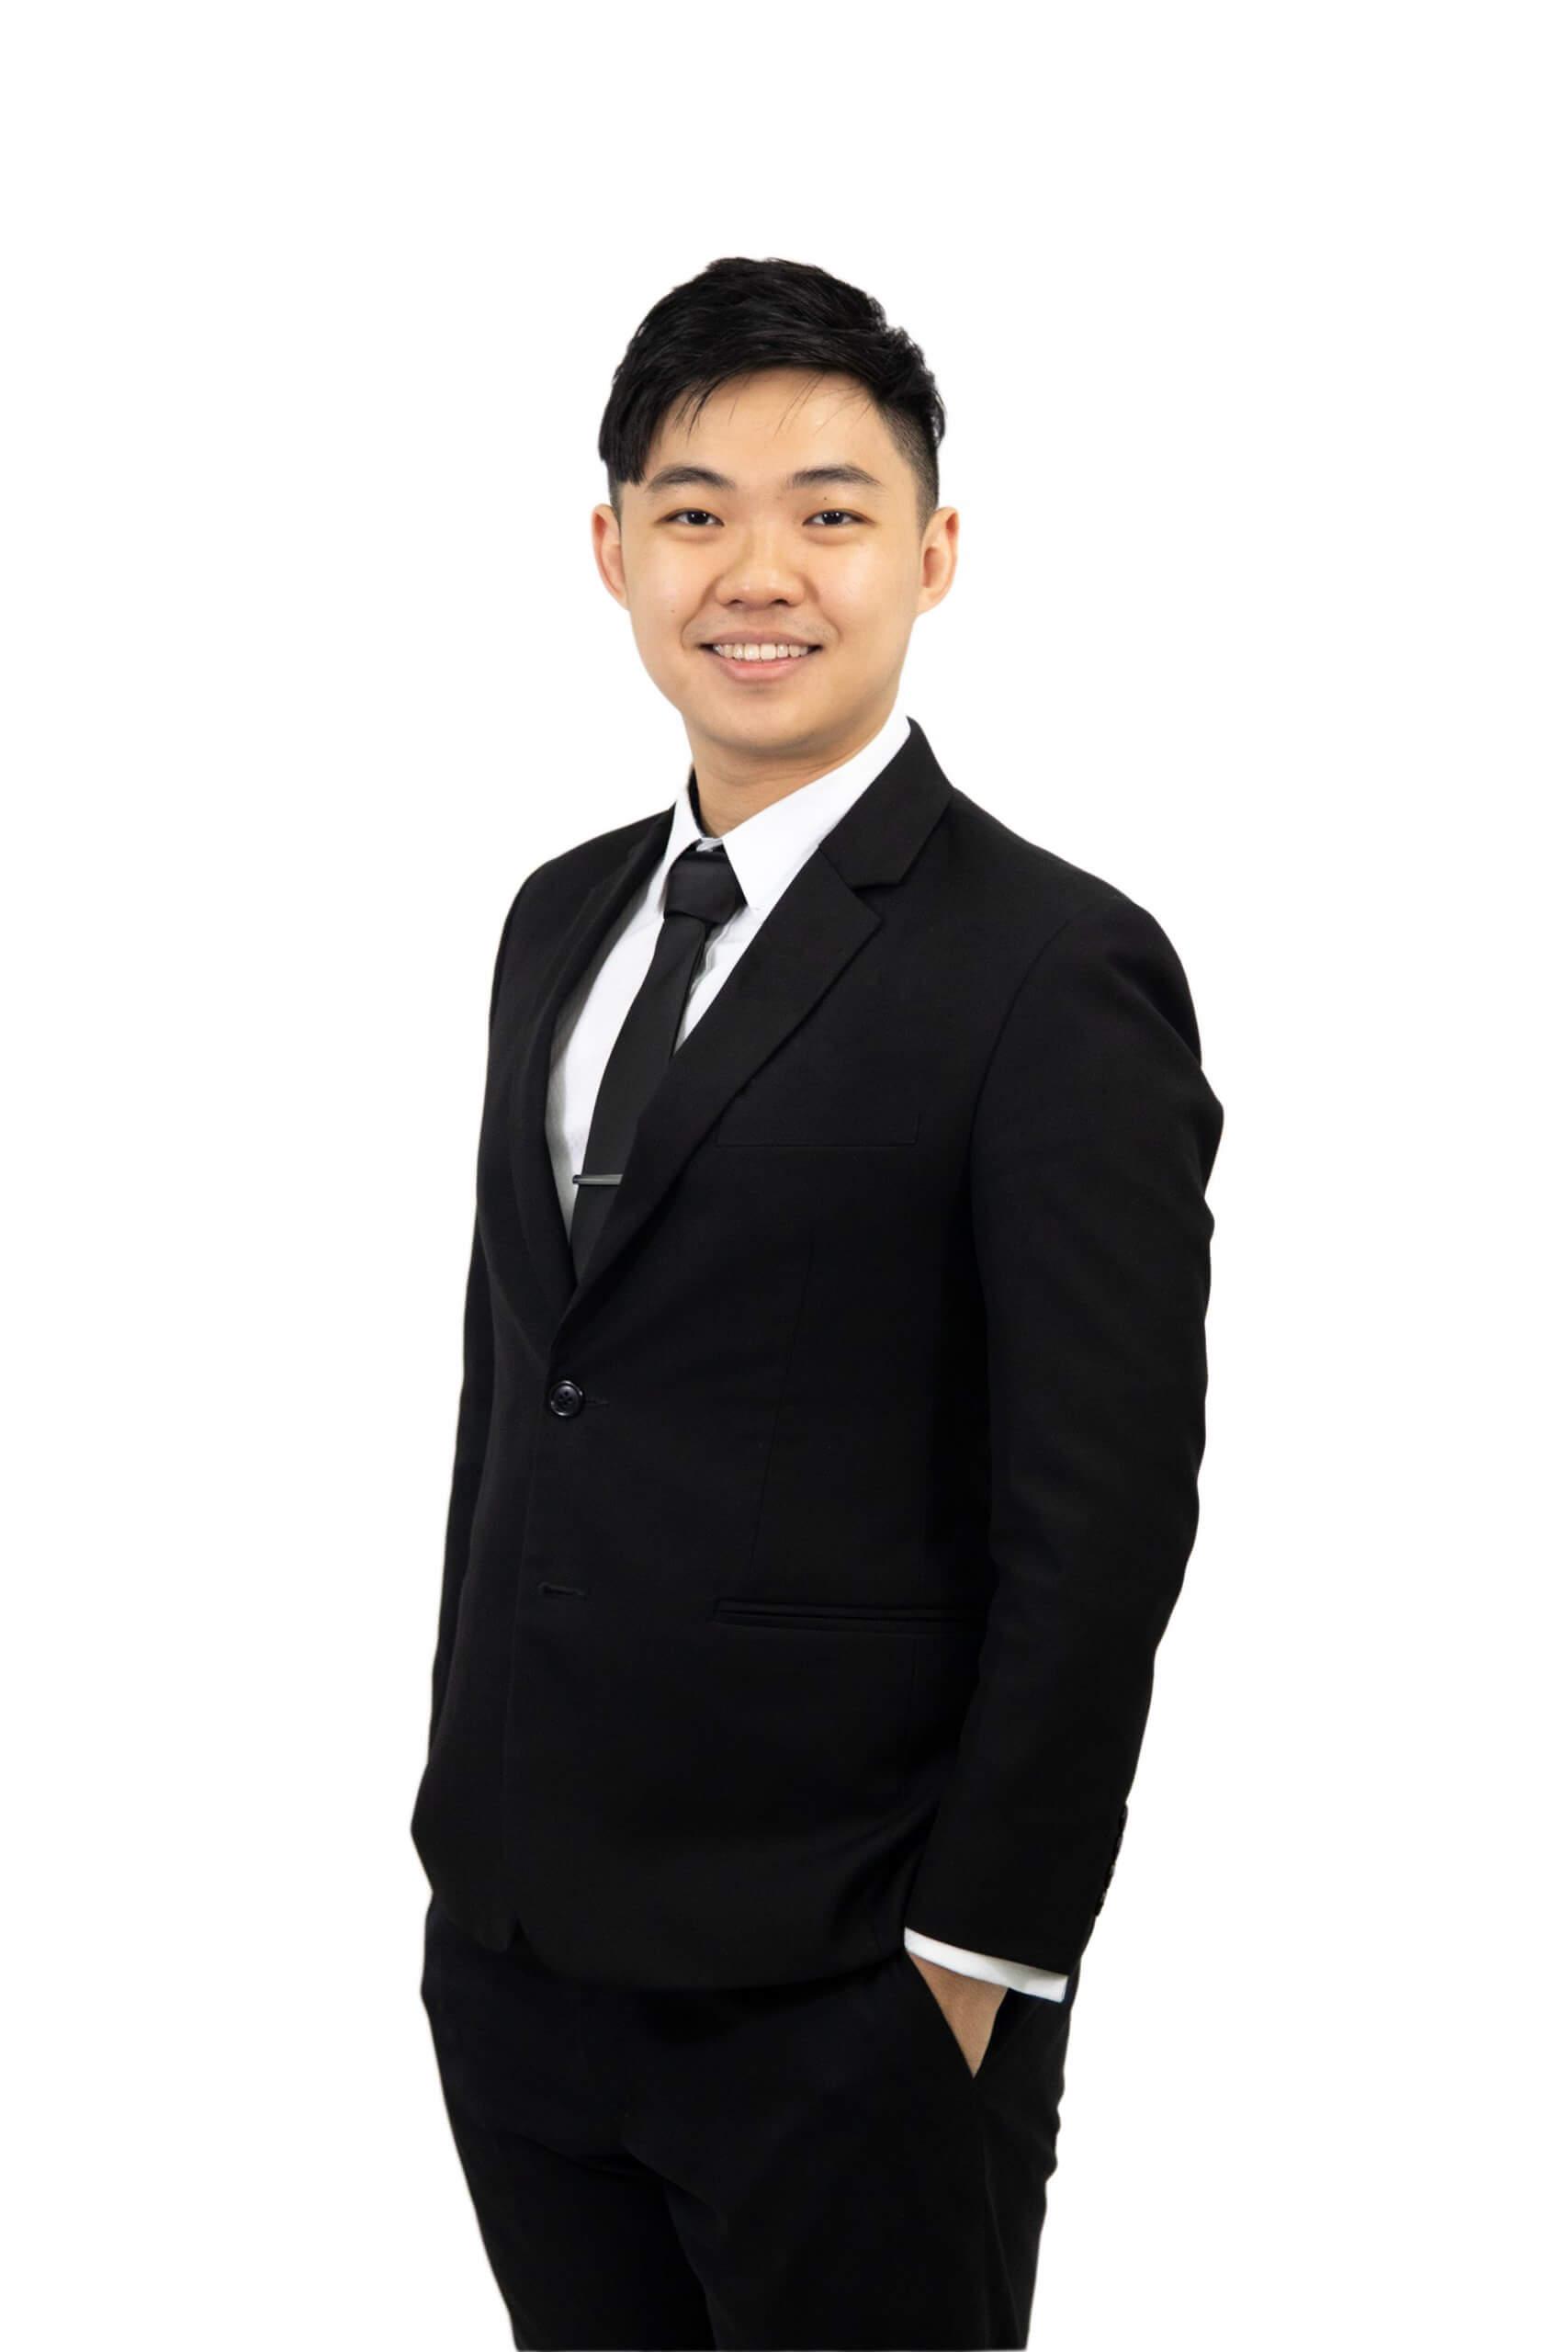 Christopher Woo